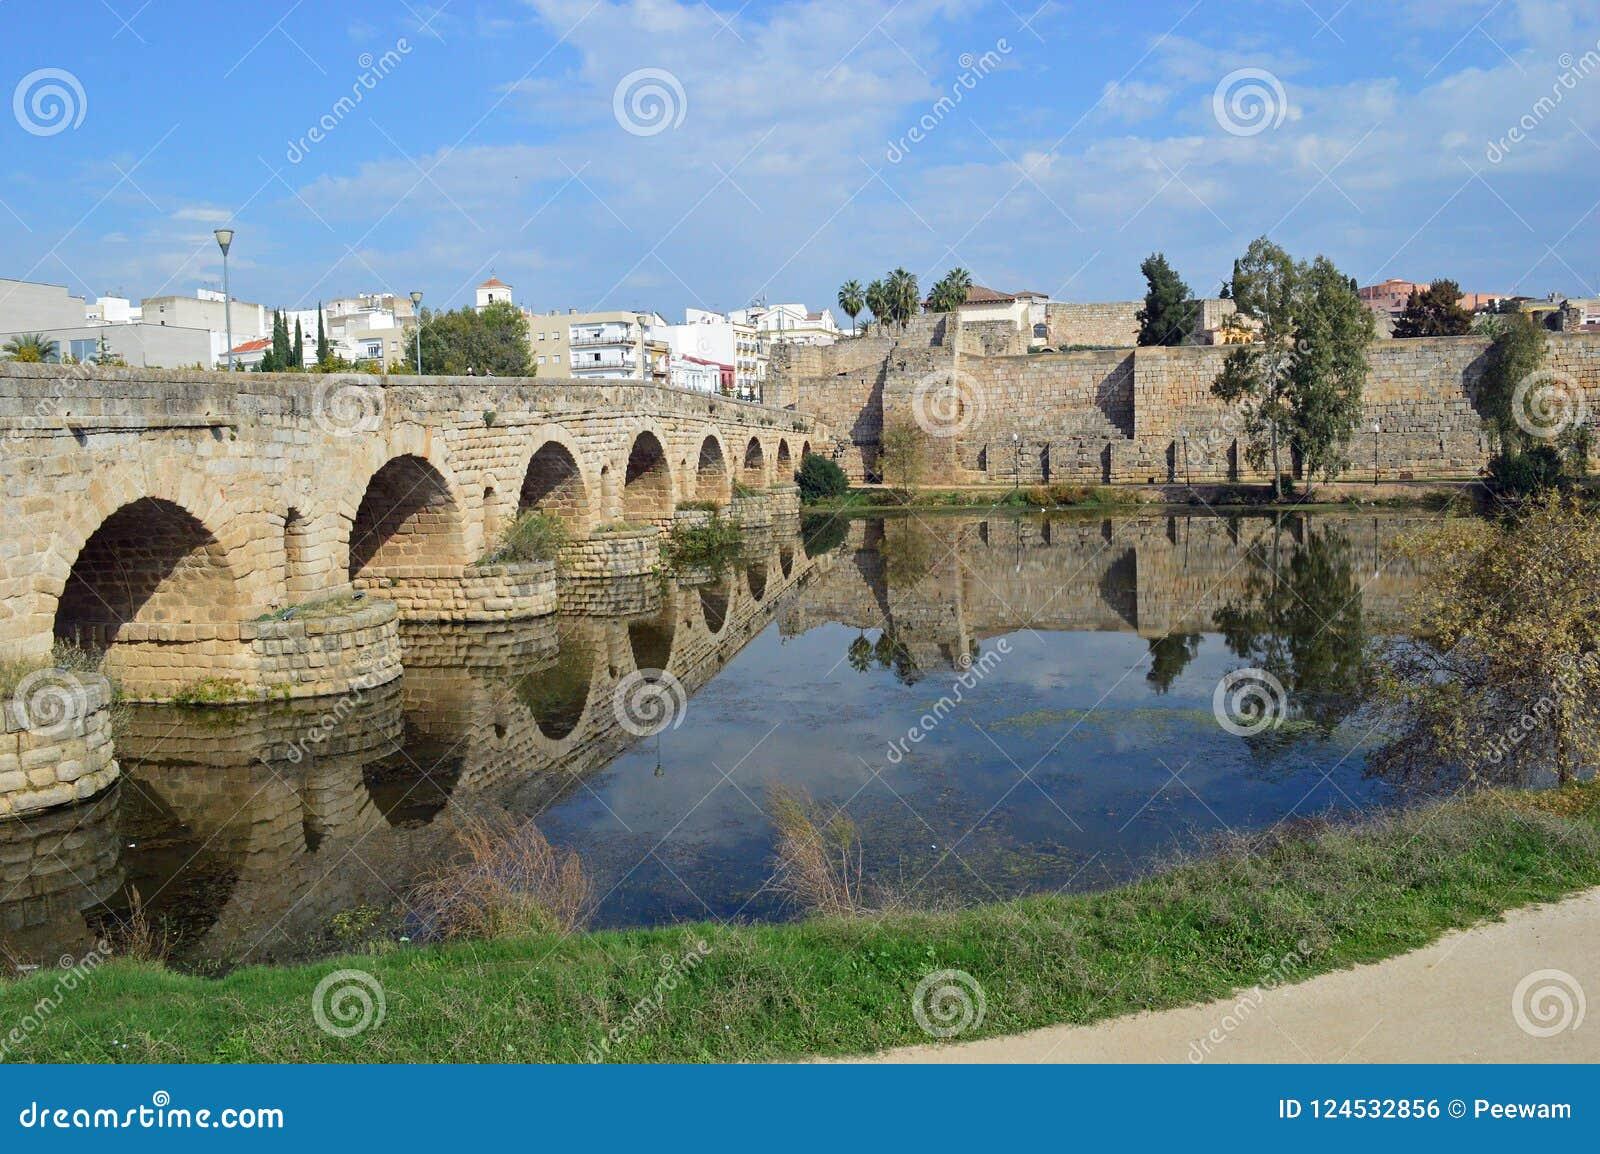 Puente Romana, Roman Bridge and the Alcazaba Merida Spain